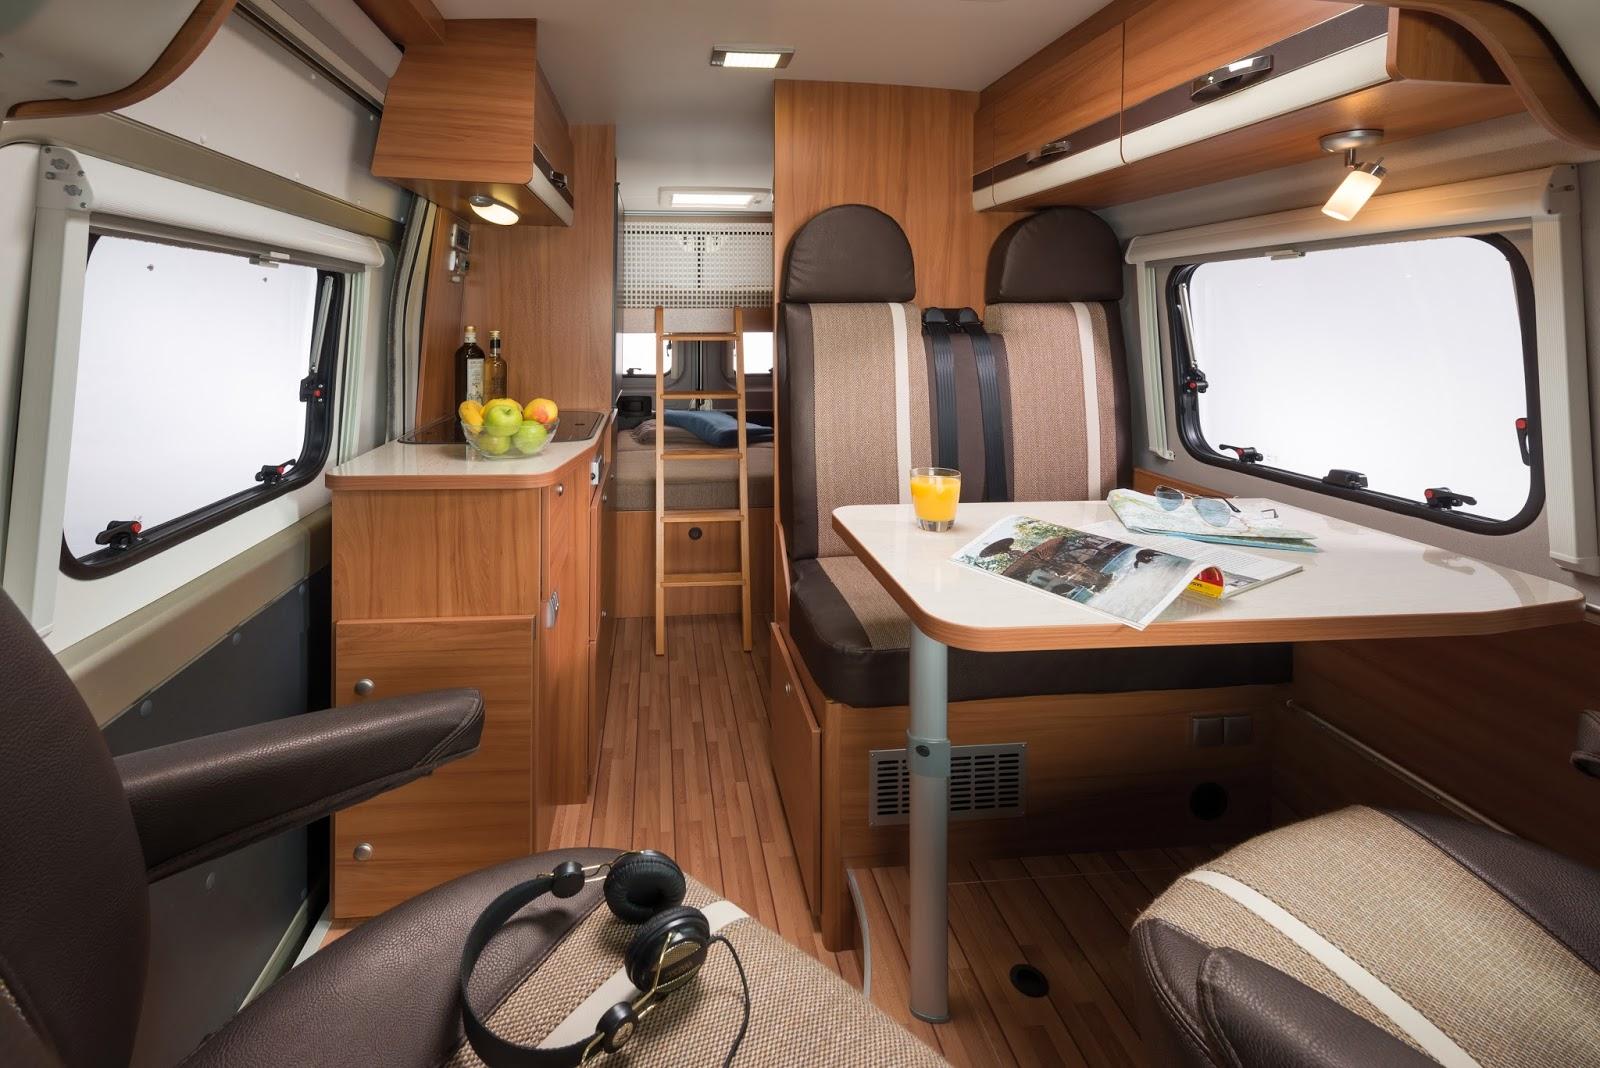 kampeerblog camper de weinsberg carabus 601 k. Black Bedroom Furniture Sets. Home Design Ideas